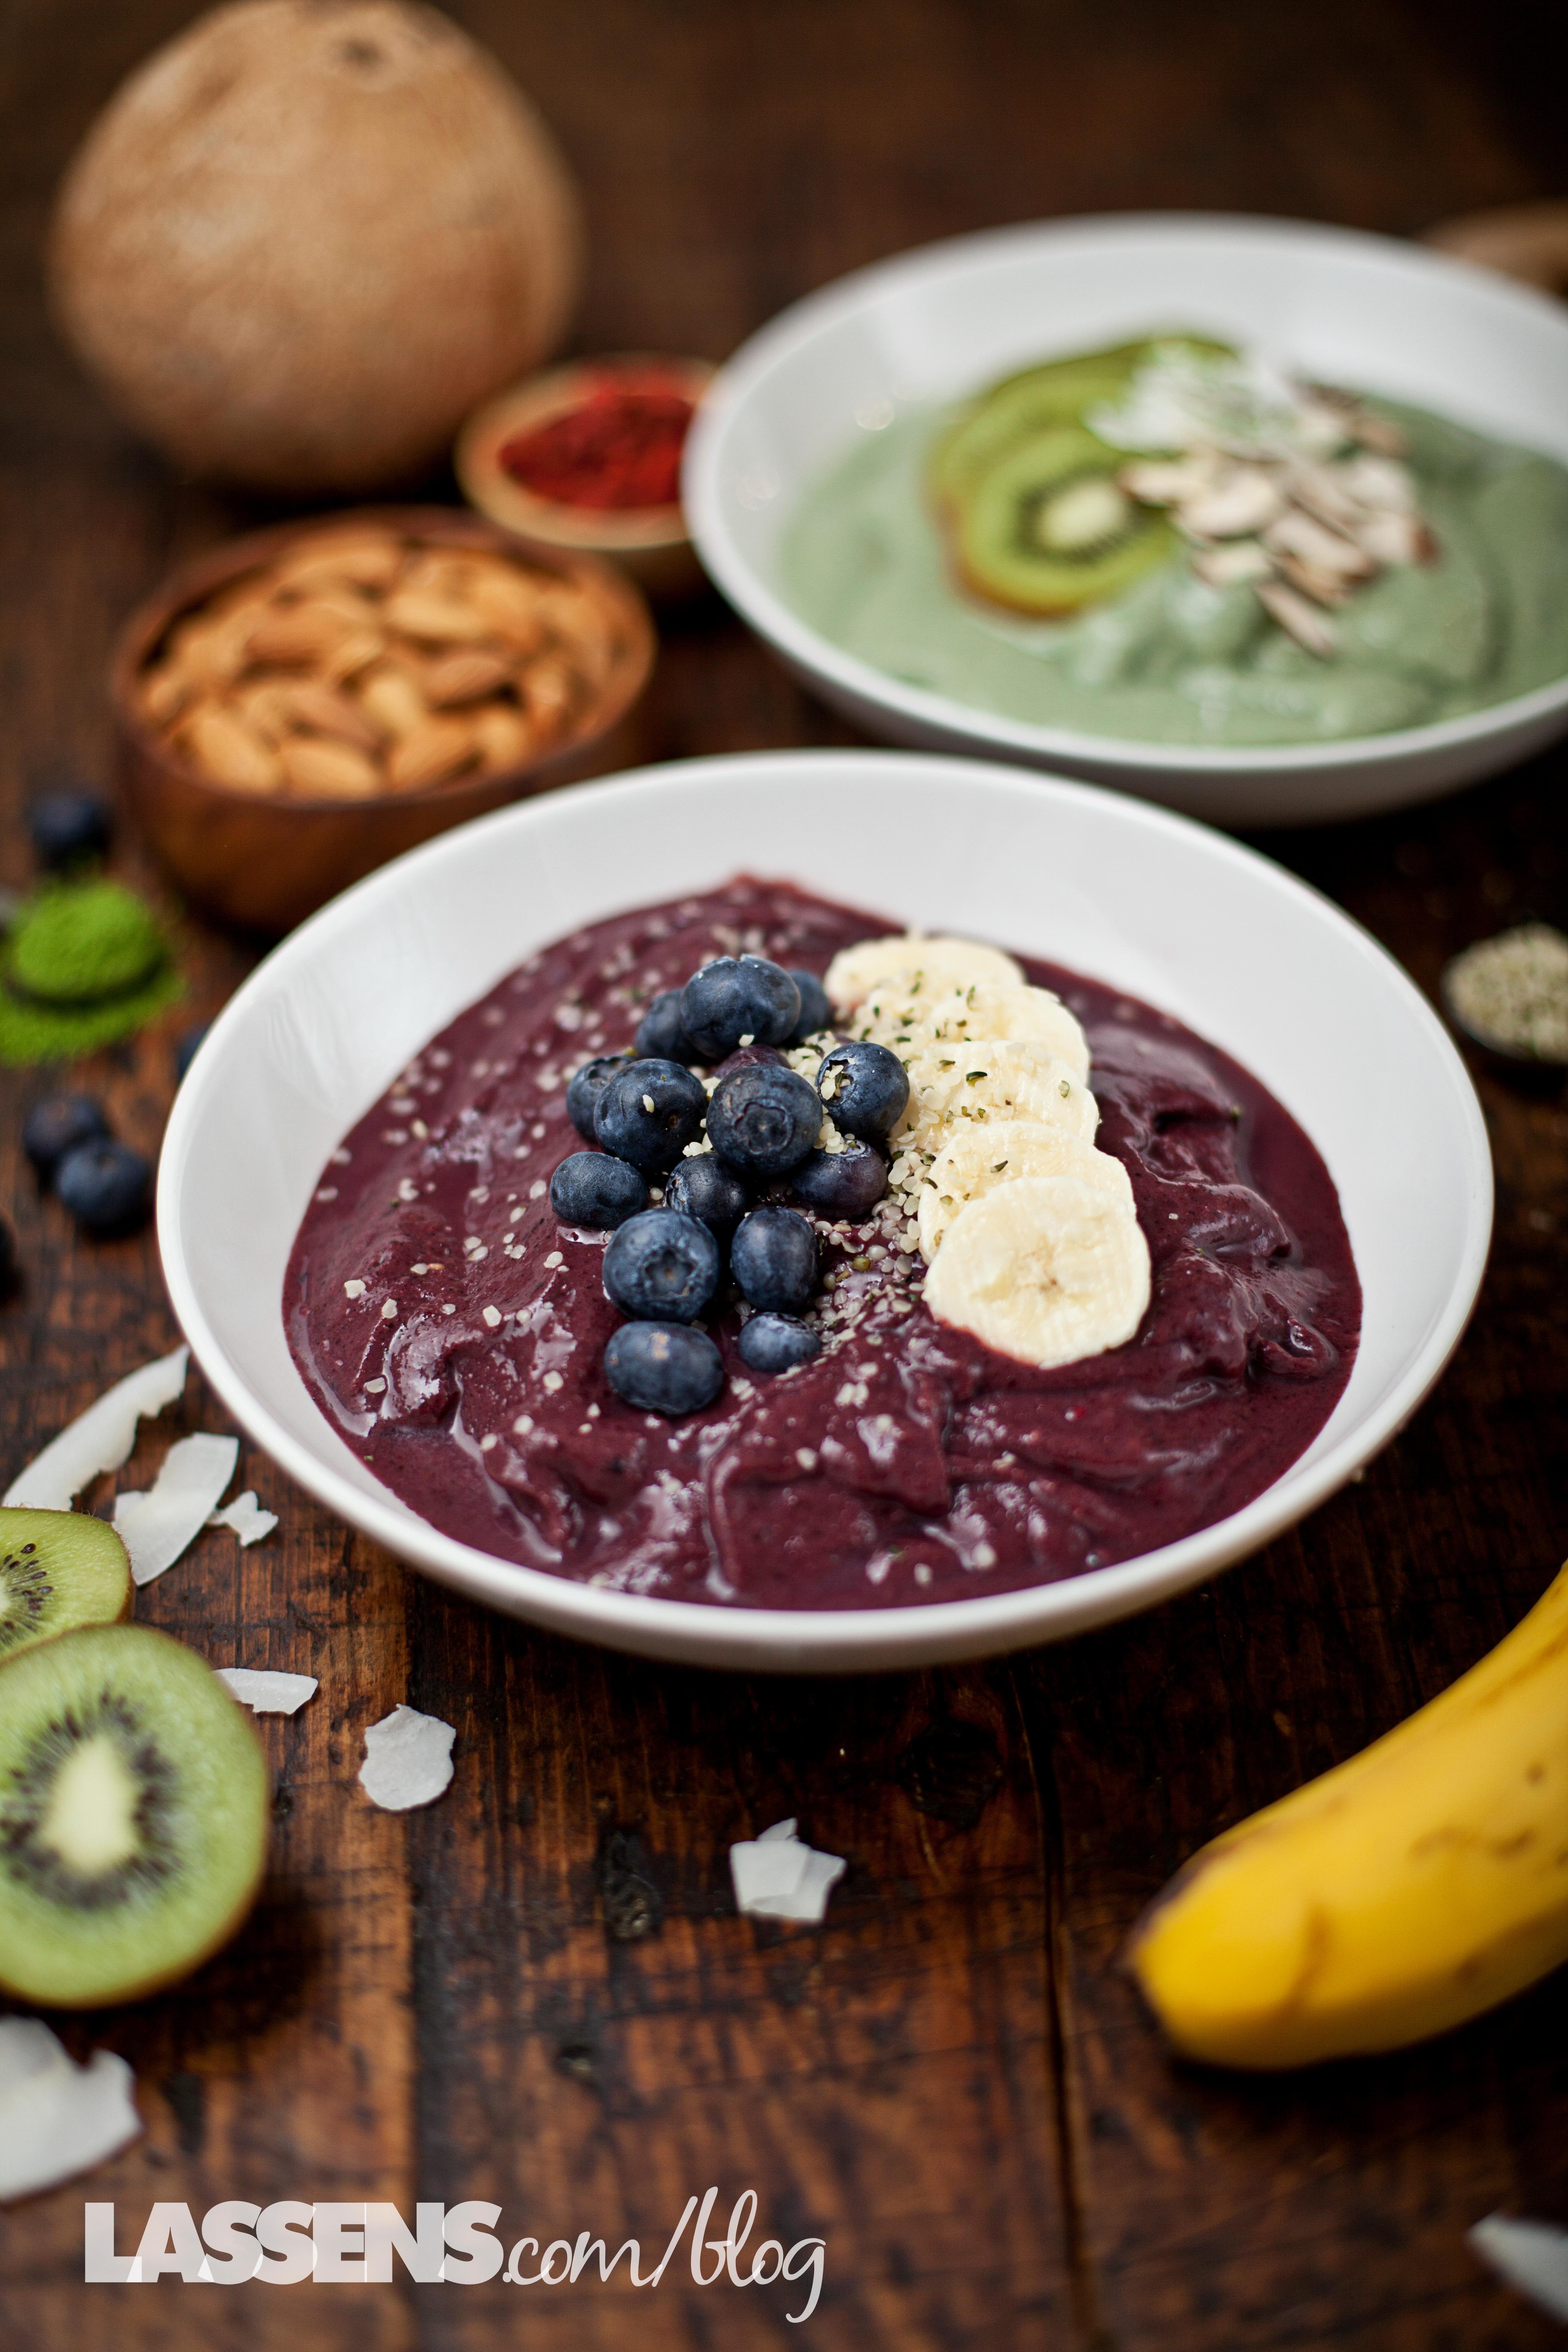 acai, acai+bowl, acai+smoothie+bowl, acai+smoothie, healthy+acai+recipes, smoothie+bowls, healthy+breakfast, superfood+recipes